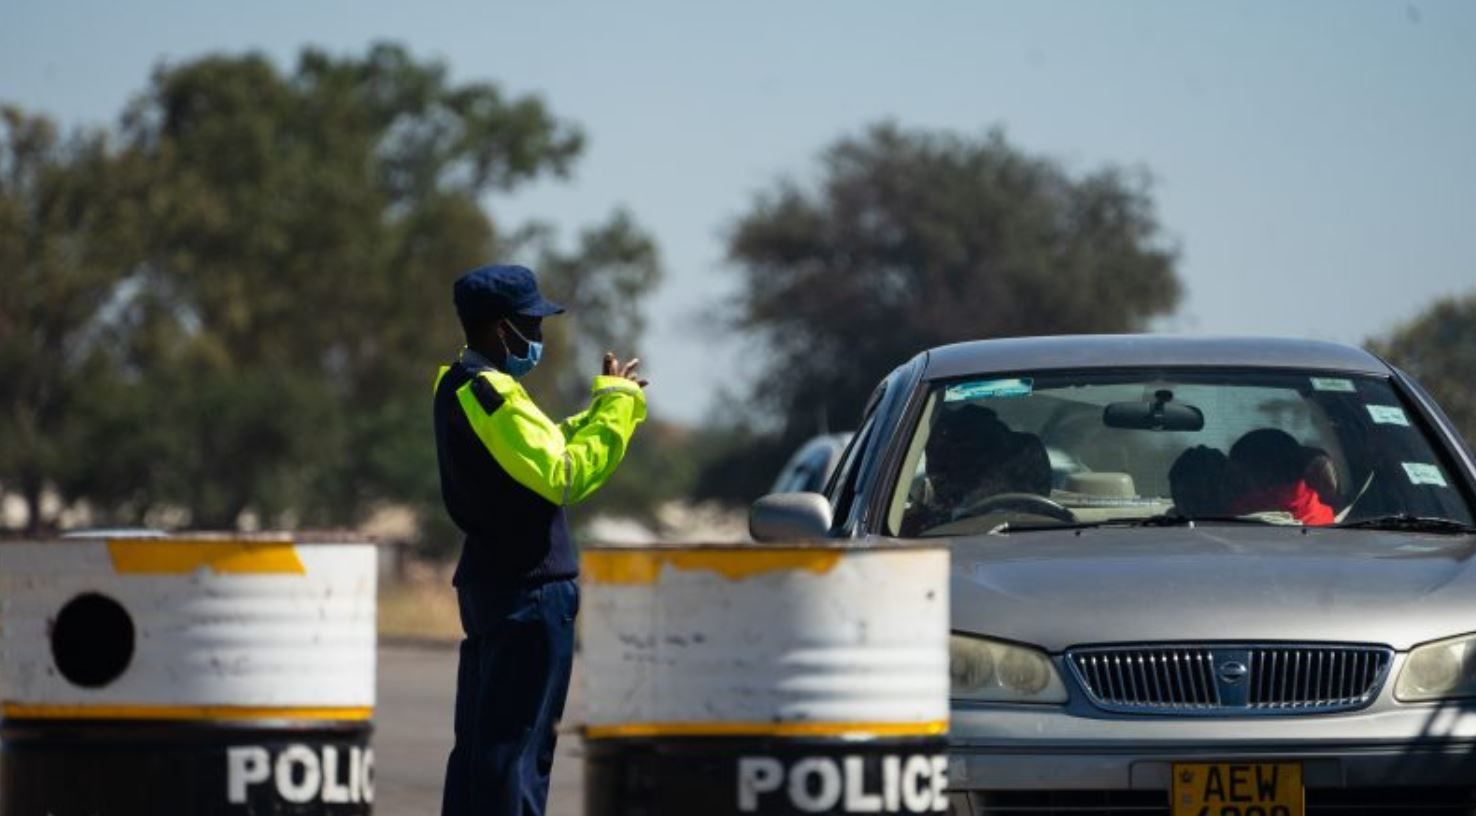 Lockdown to Shutdown: How COVID-19 Stifled Digital Rights in Zimbabwe 1